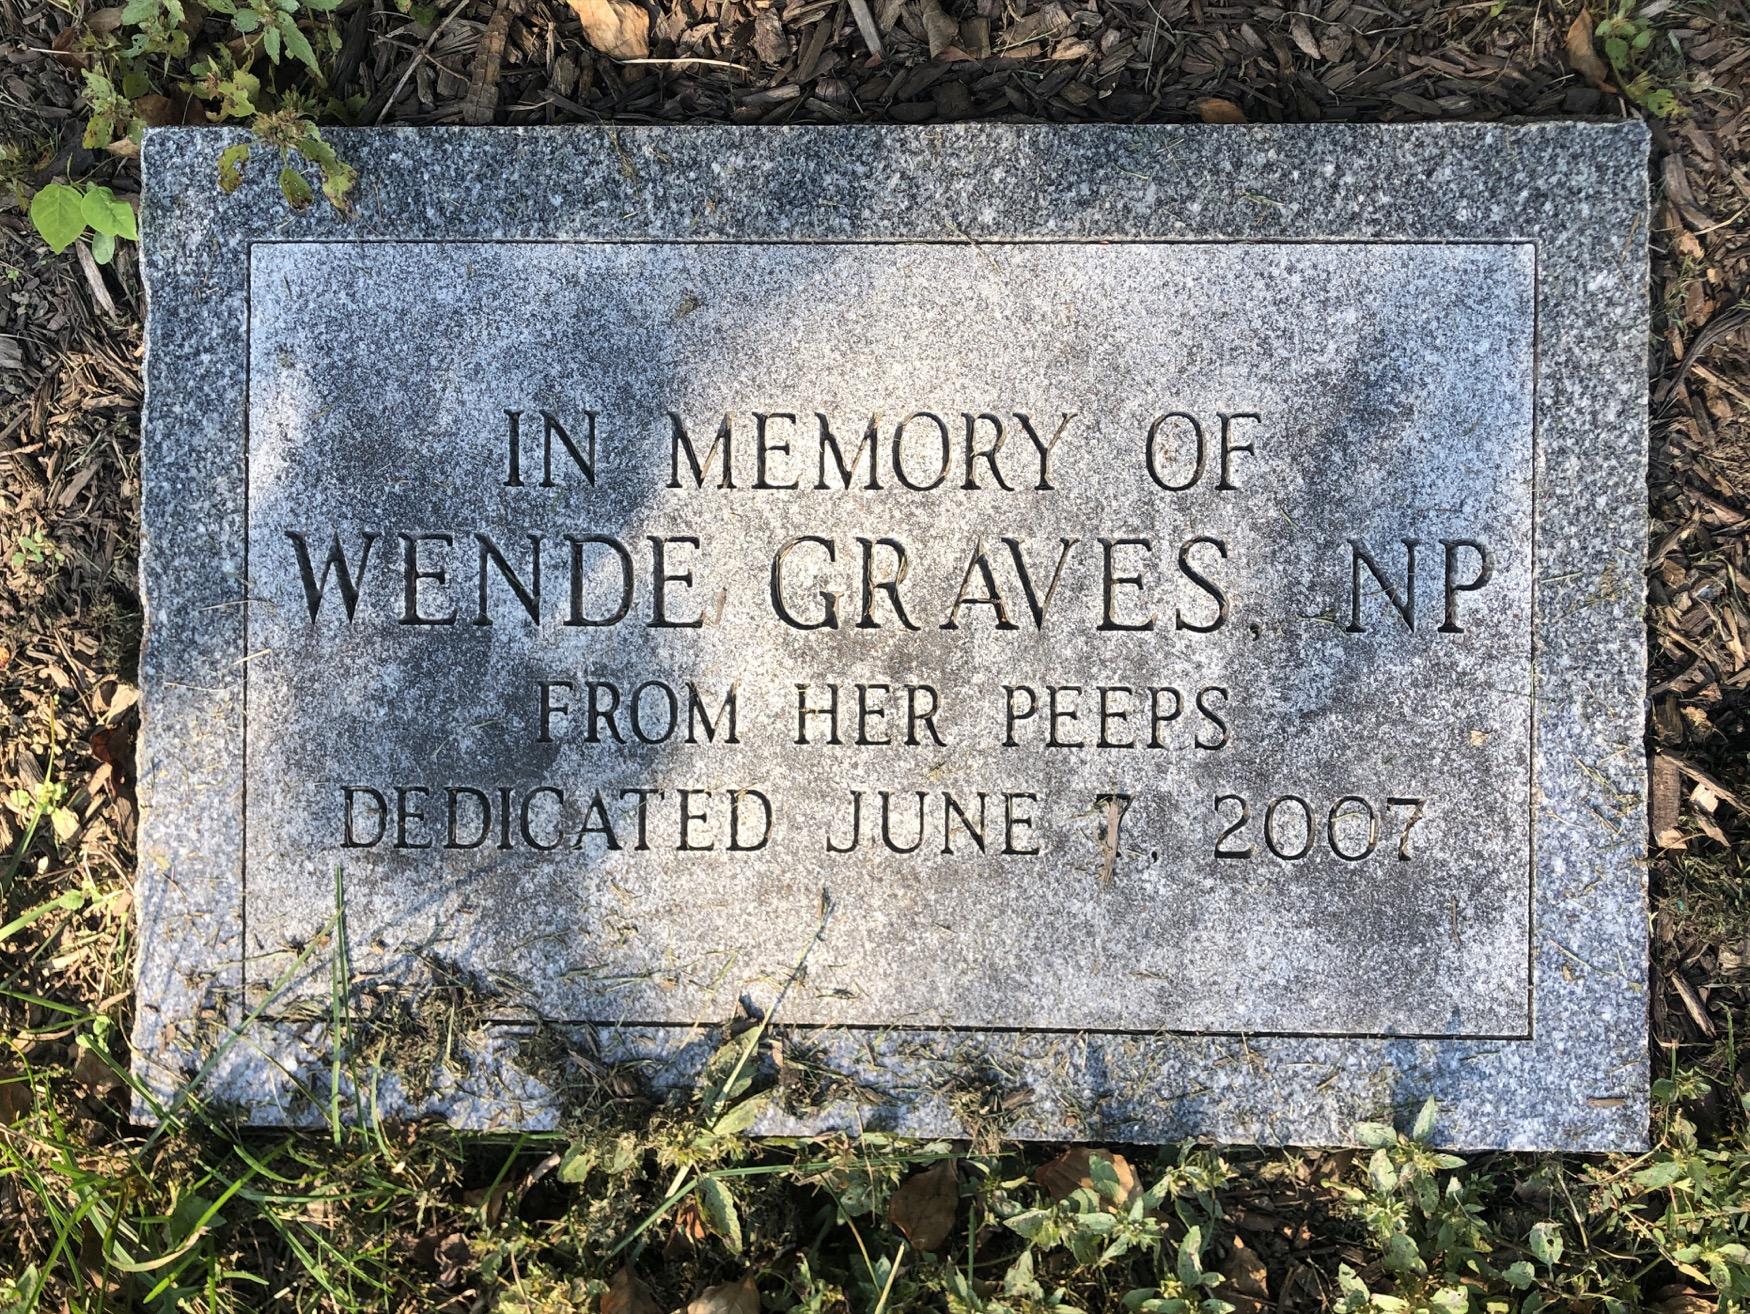 Wende Graves Tribute Tree Marker